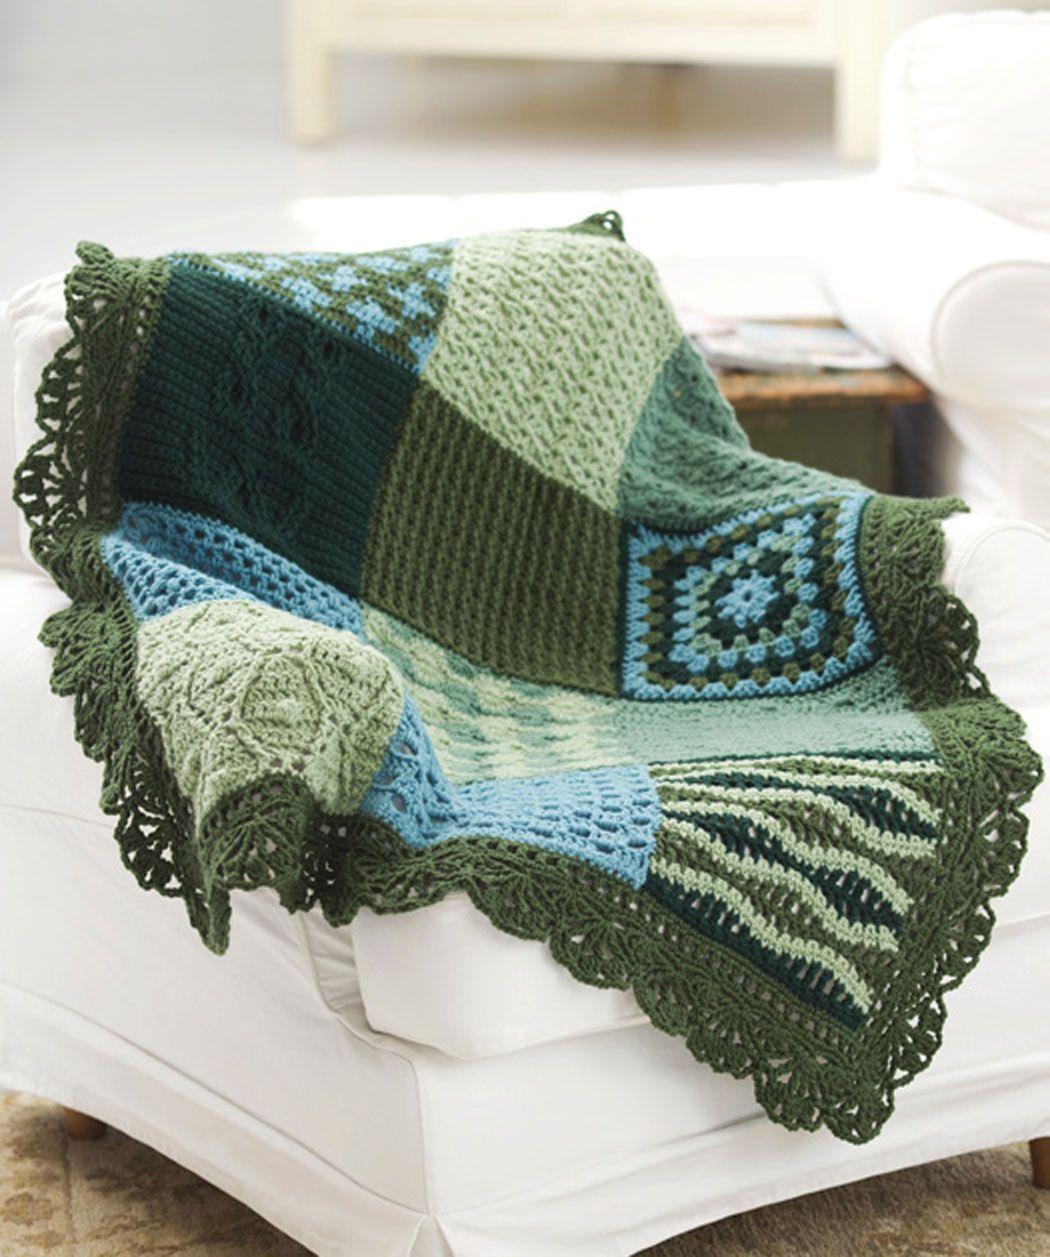 Double Ended Crochet Hook Patterns Reversible Double Ended Crochet